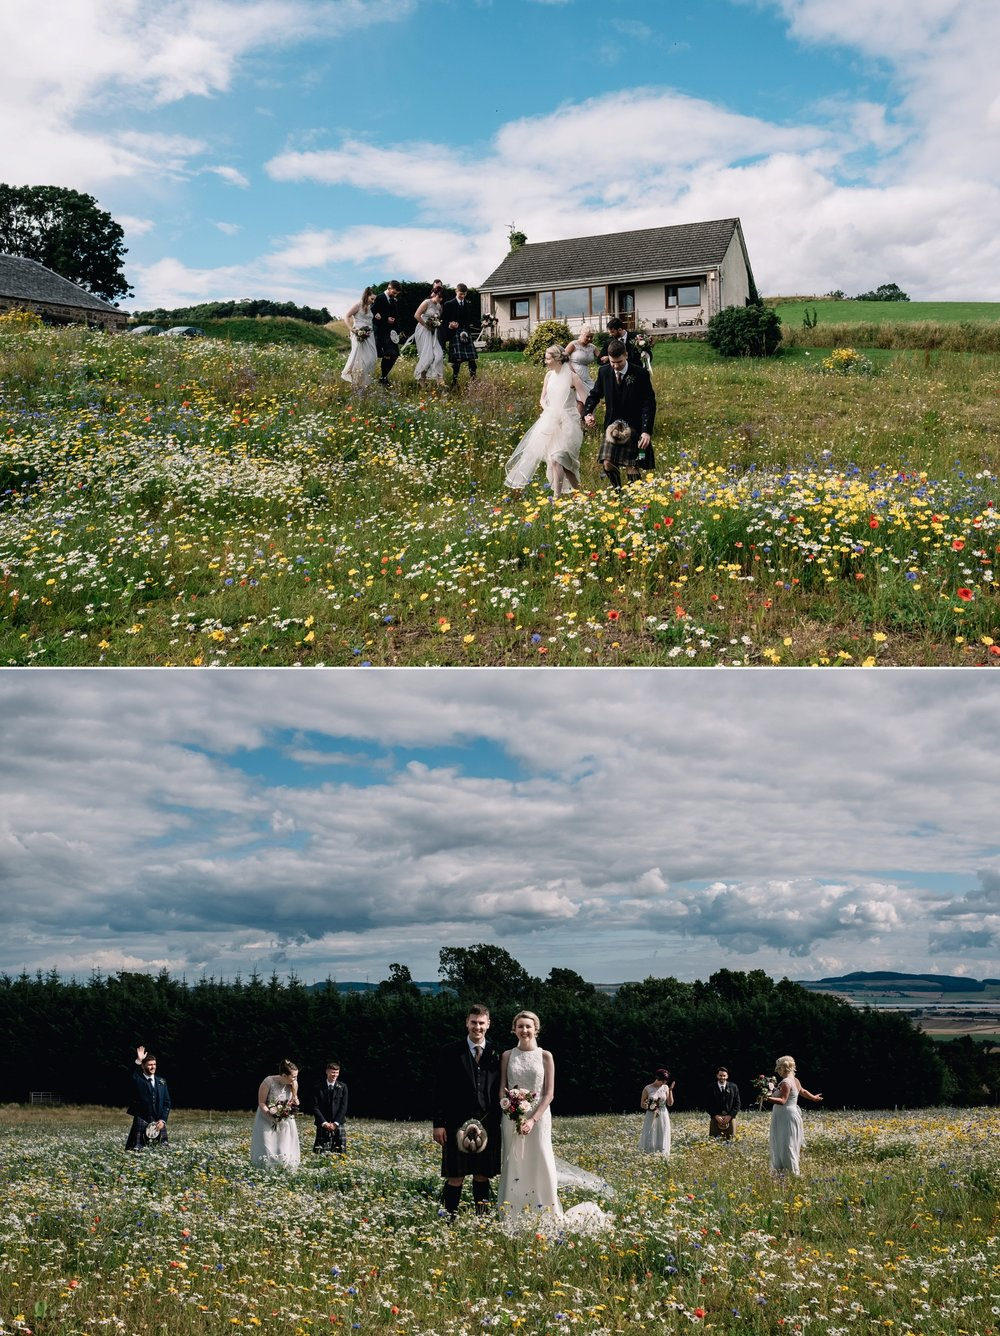 282-Rebeca-Tom-Wedding-Guardswell.JPG